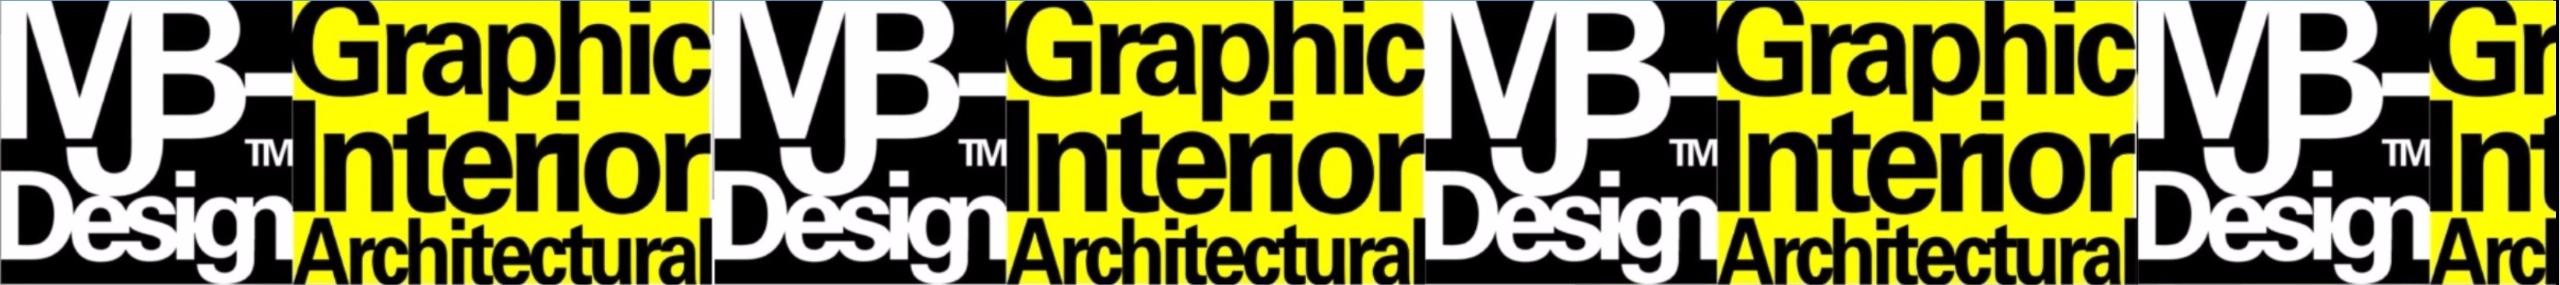 Michael J. Bernard, Design Consultant (@michaeljbernard) Cover Image